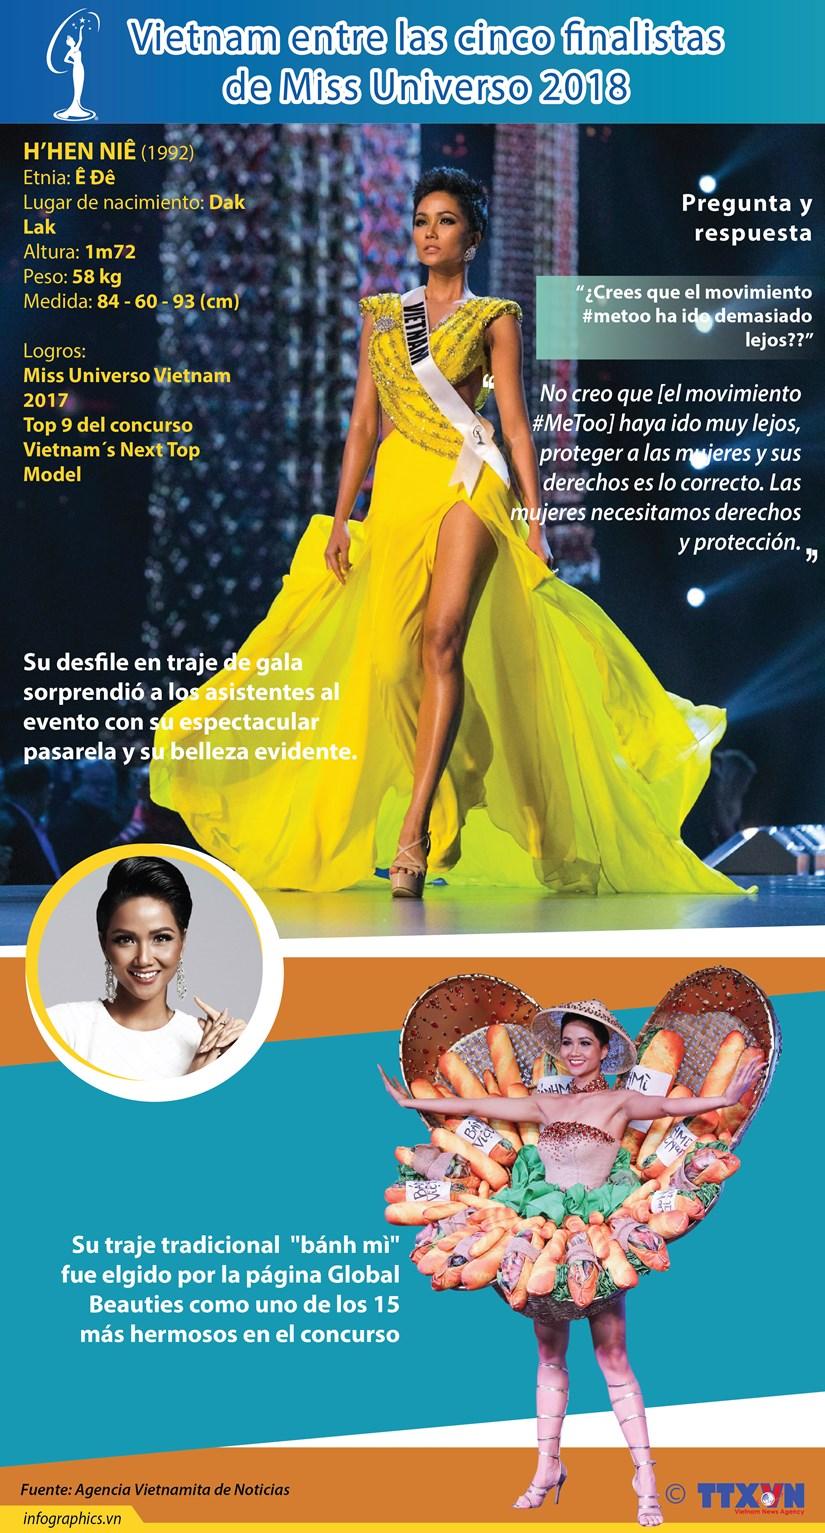 [Infografia] Vietnam entre las cinco finalistas de Miss Universo 2018 hinh anh 1